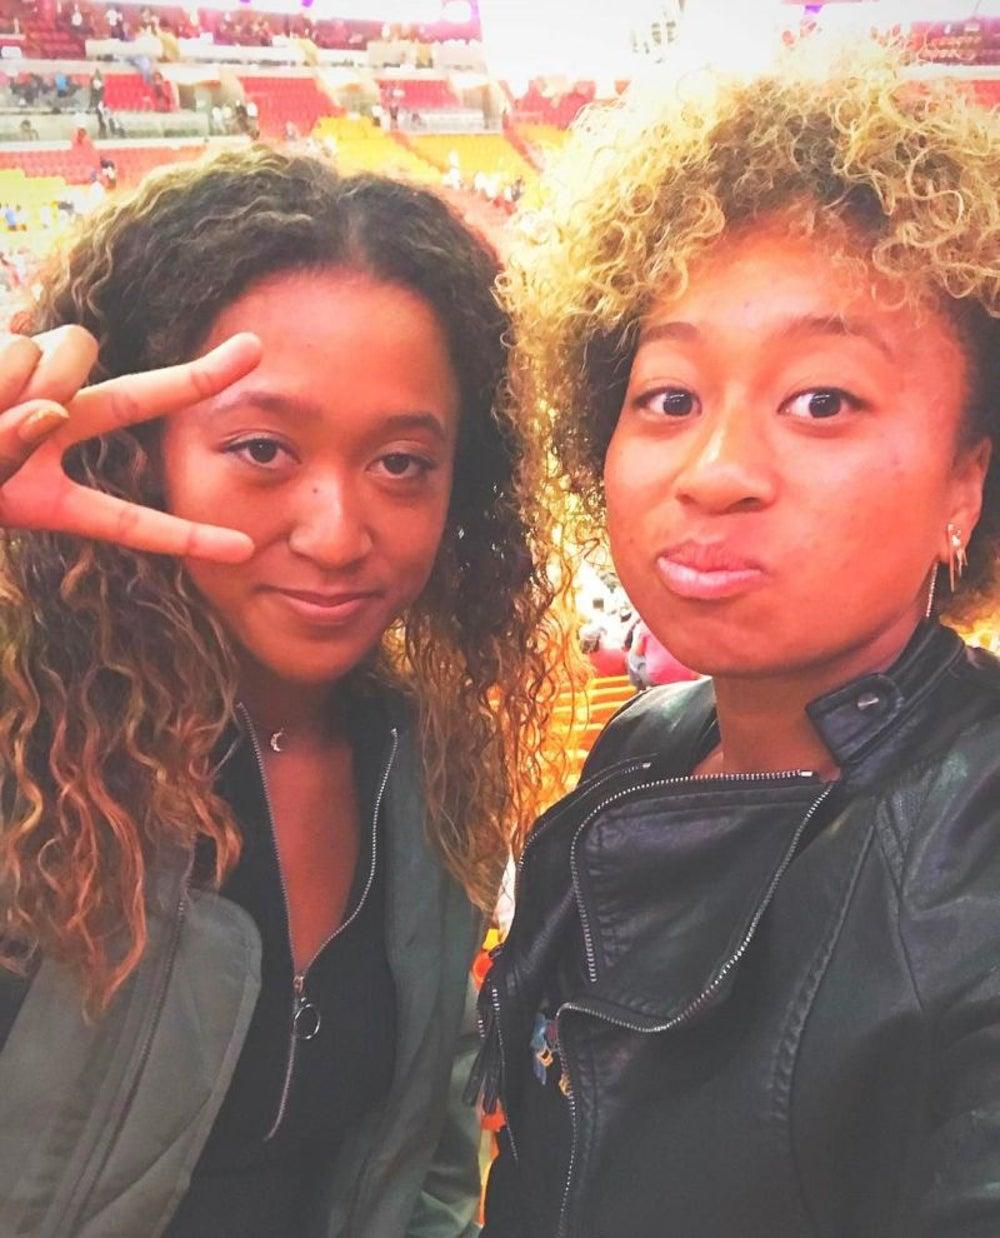 Osaka Sisters- The Tennis Sensations